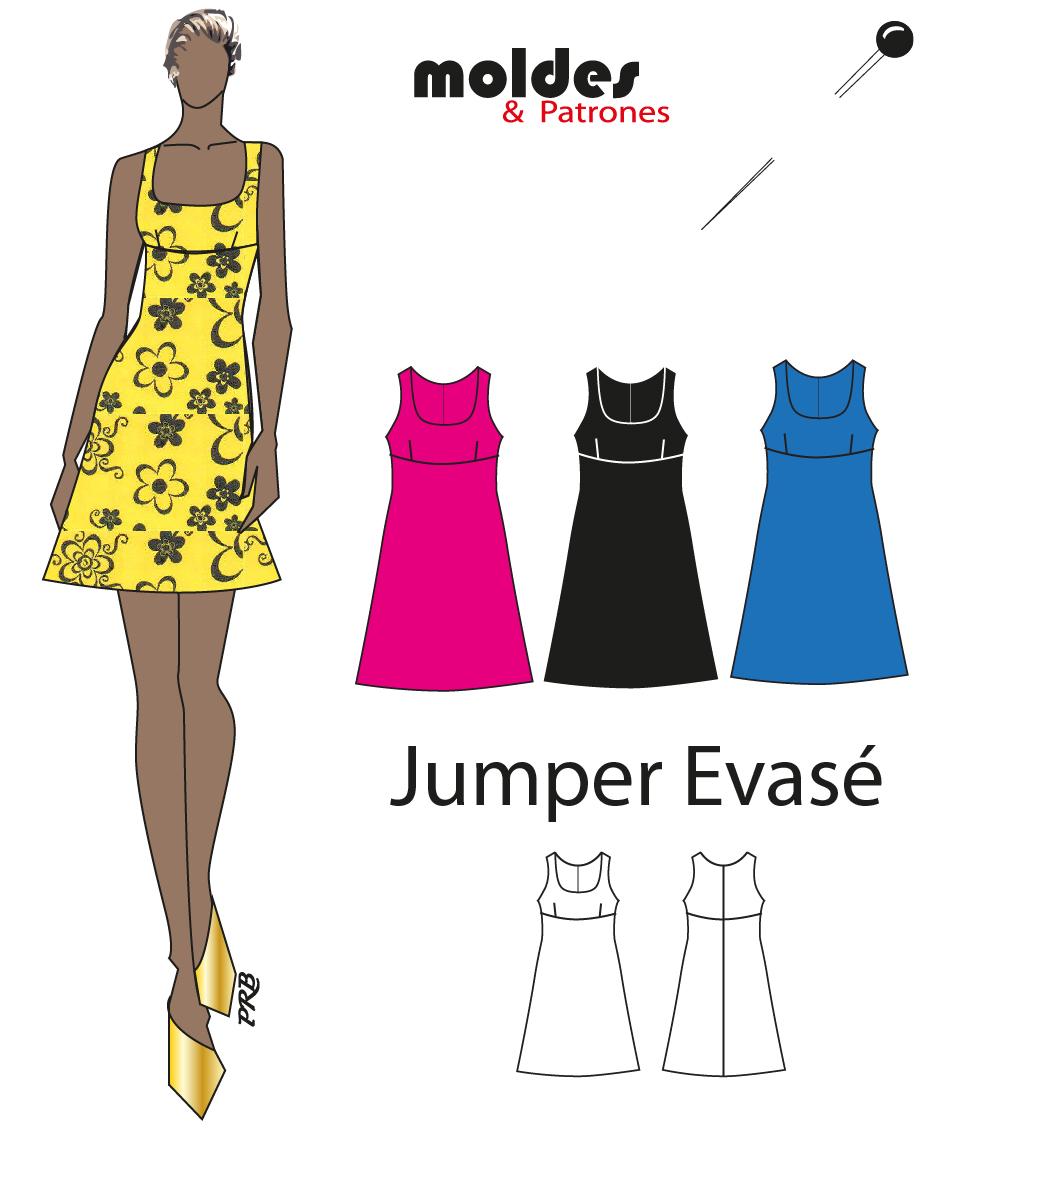 3 Tallas S M L Mini Vestido (jumper evasé)